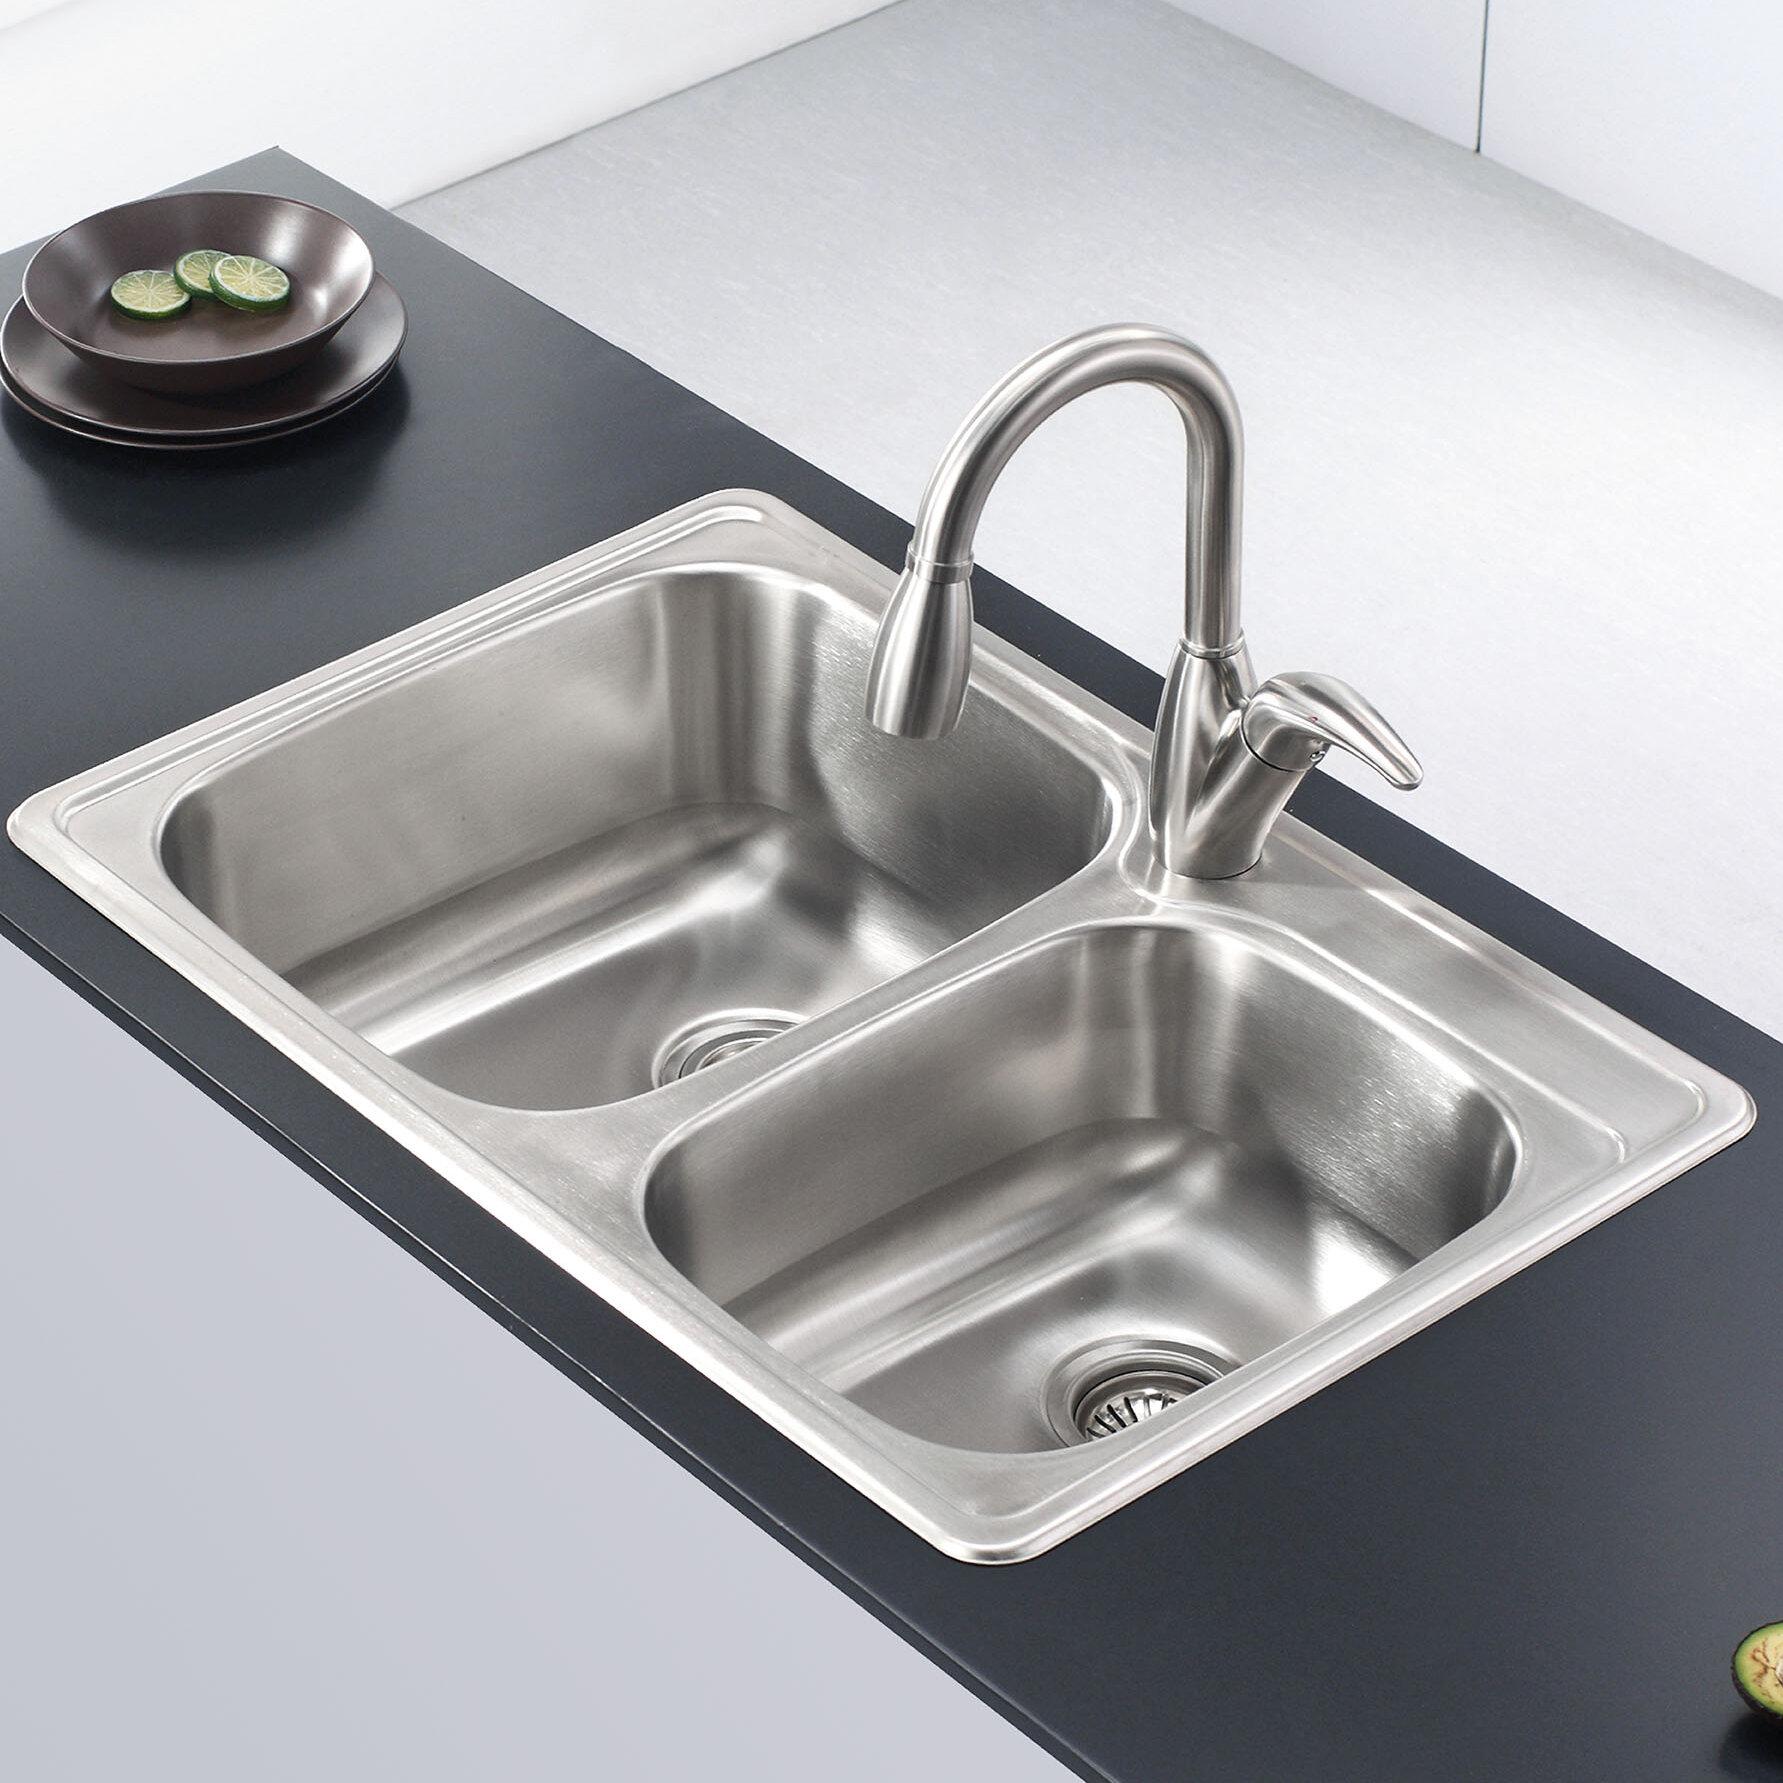 Kraus stainless steel 33 l x 22 w double basin drop in kitchen sink reviews wayfair